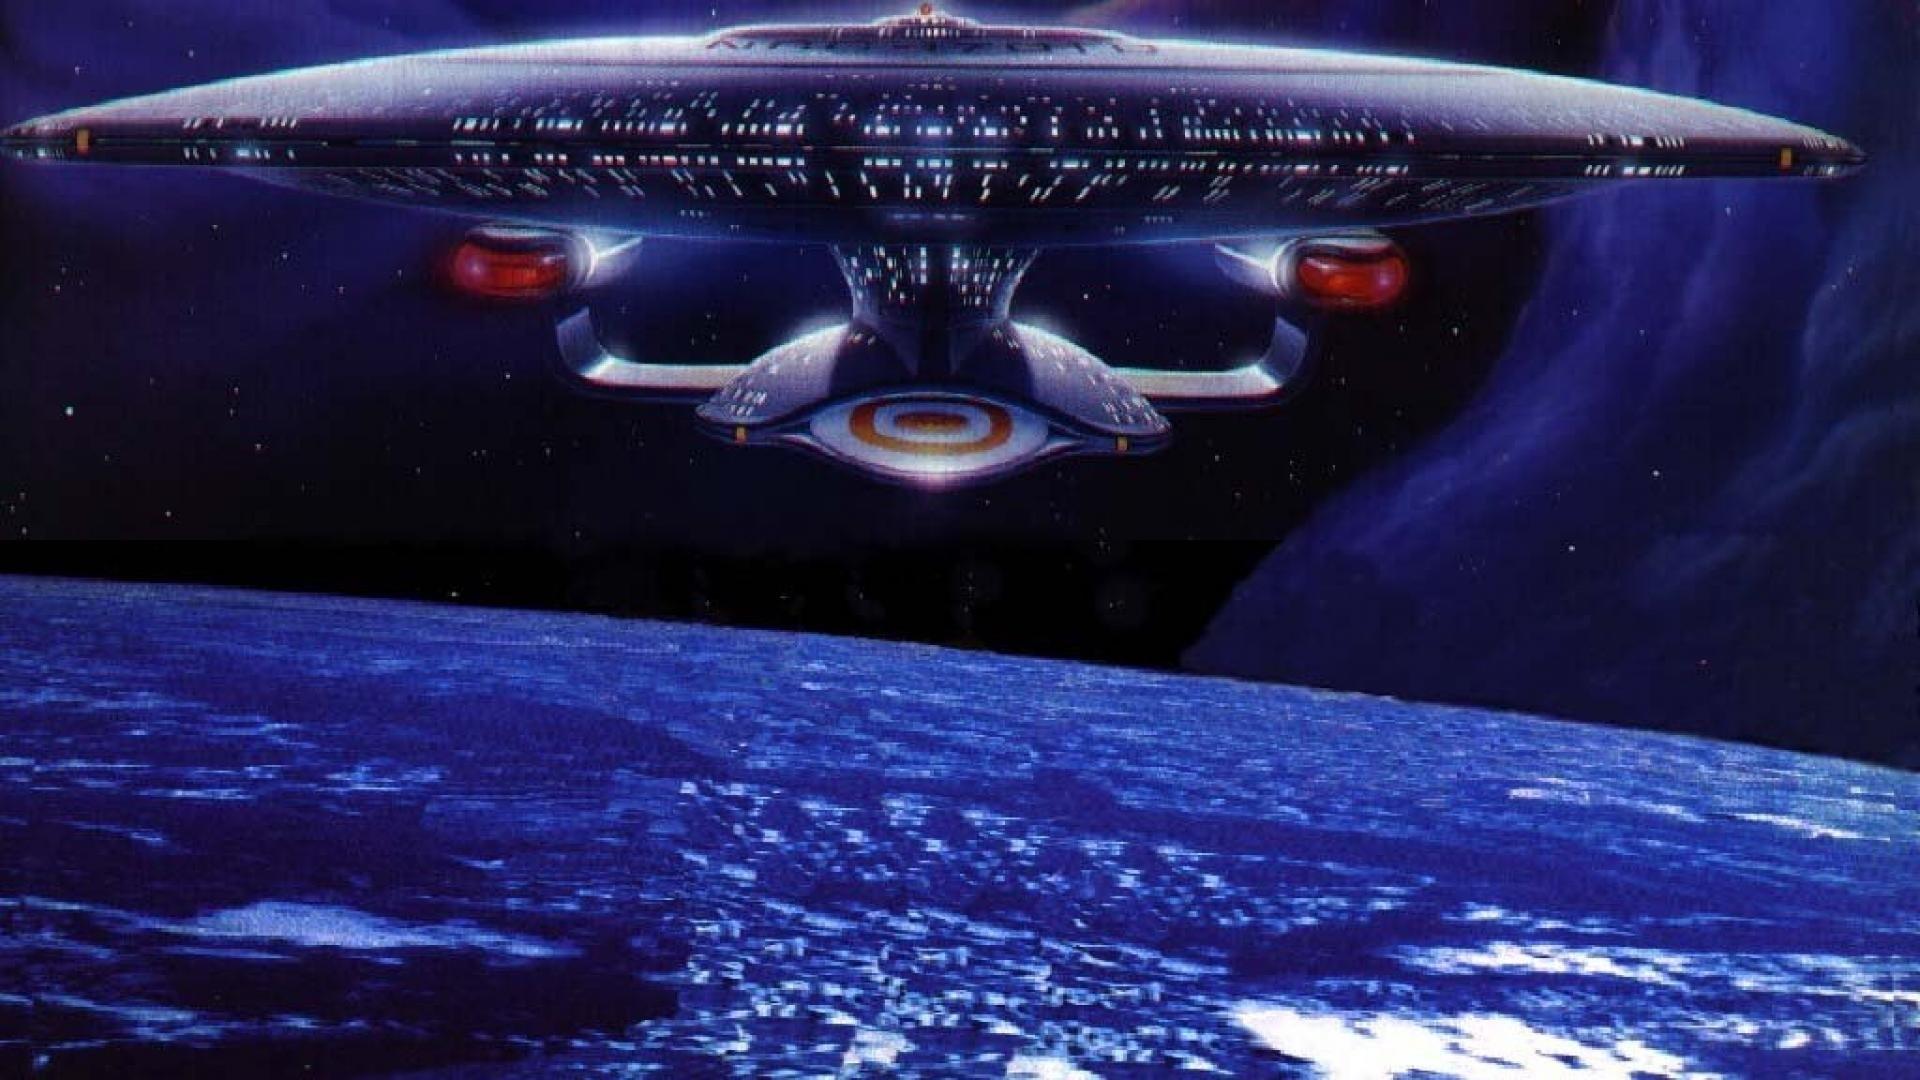 star trek next generation enterprise - walldevil